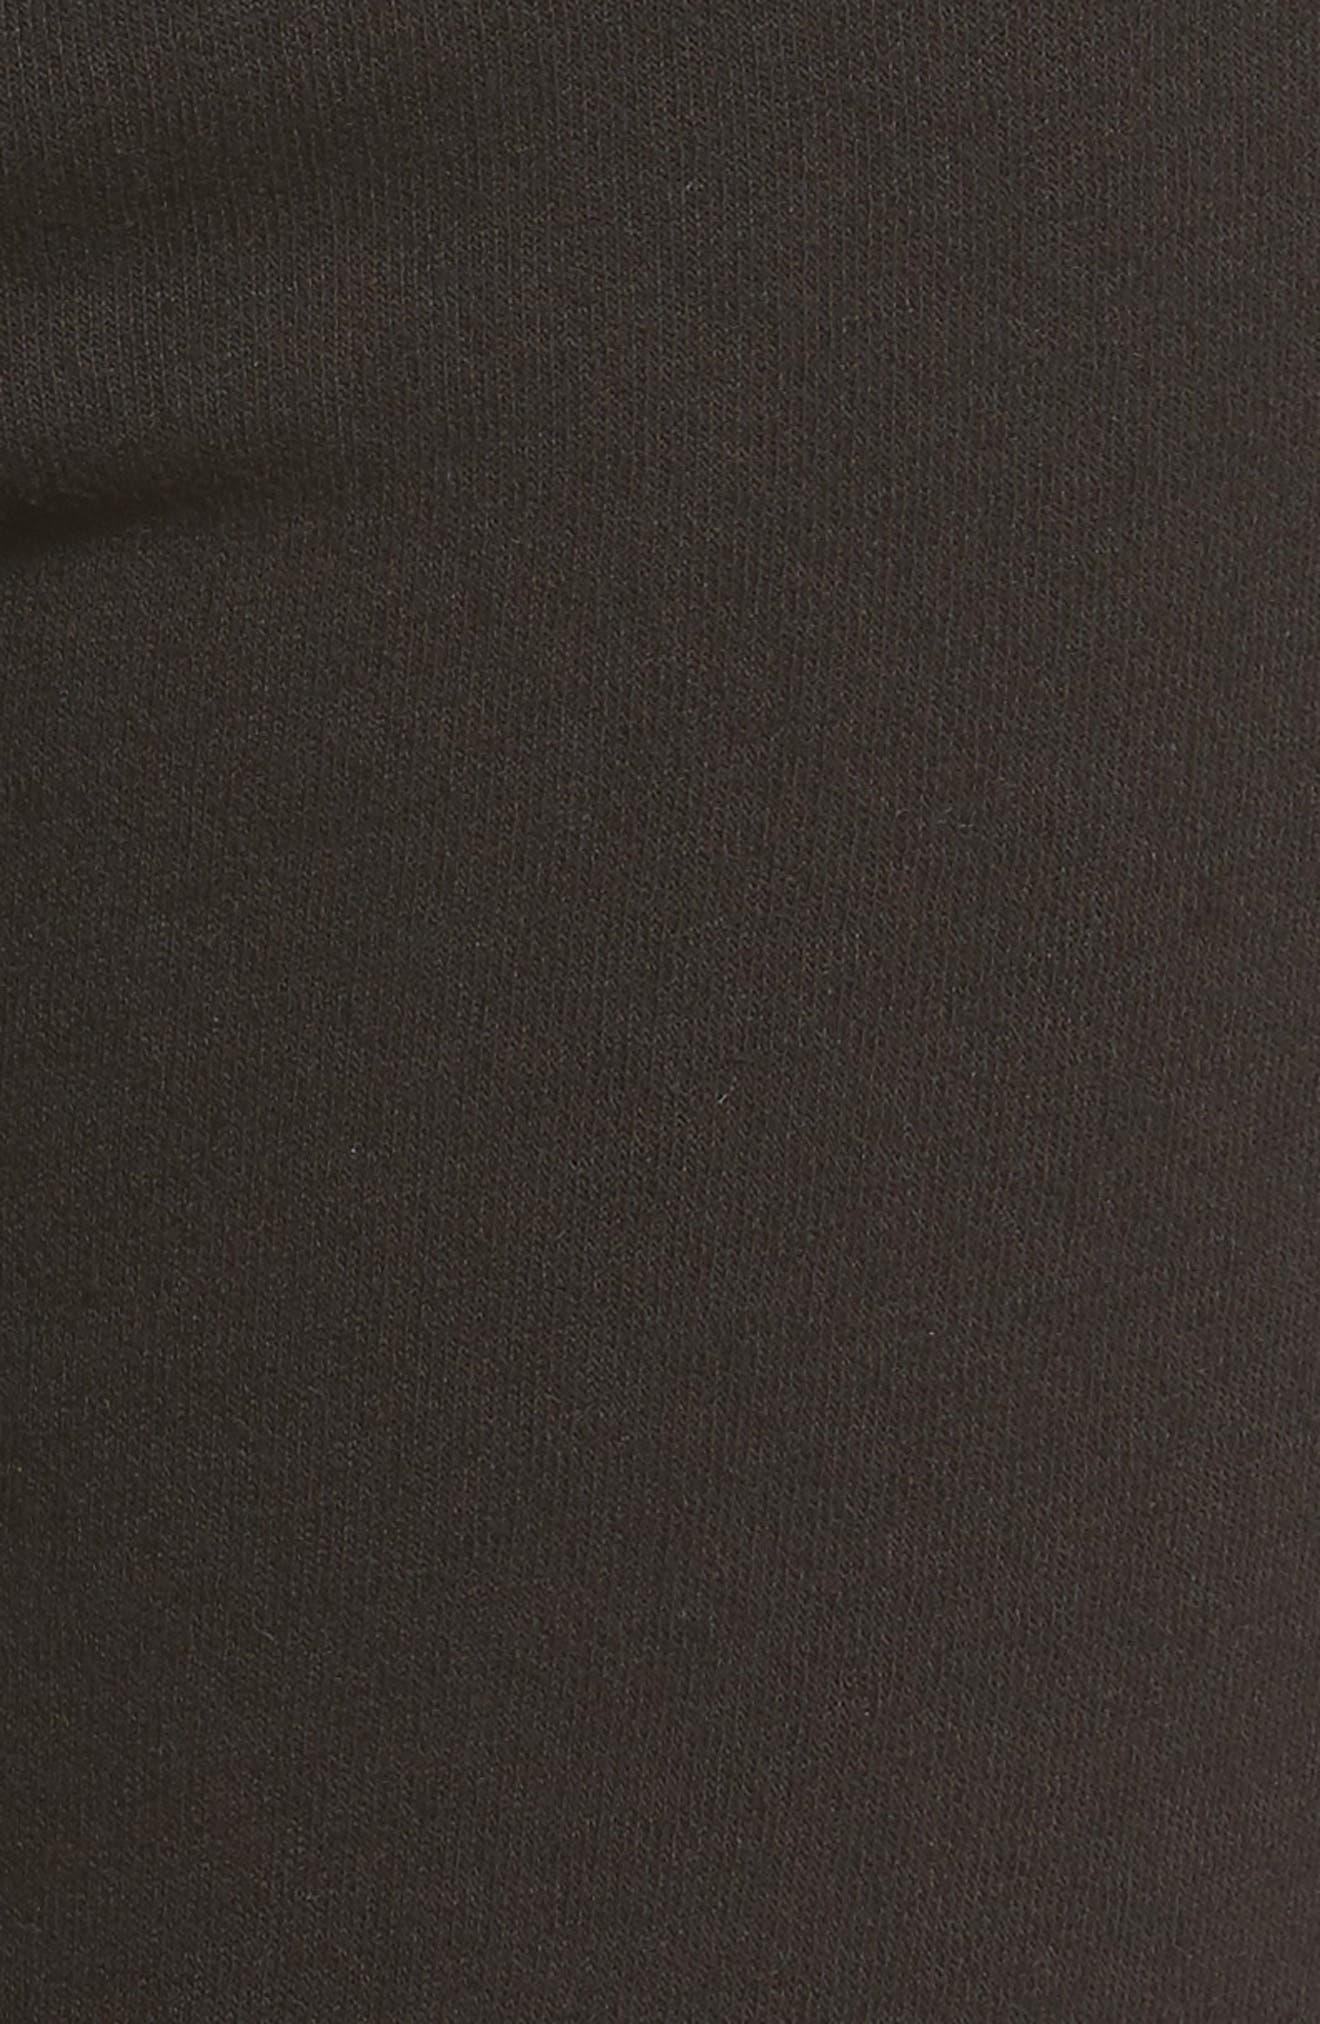 Betsee Distressed Jogger Pants,                             Alternate thumbnail 5, color,                             001